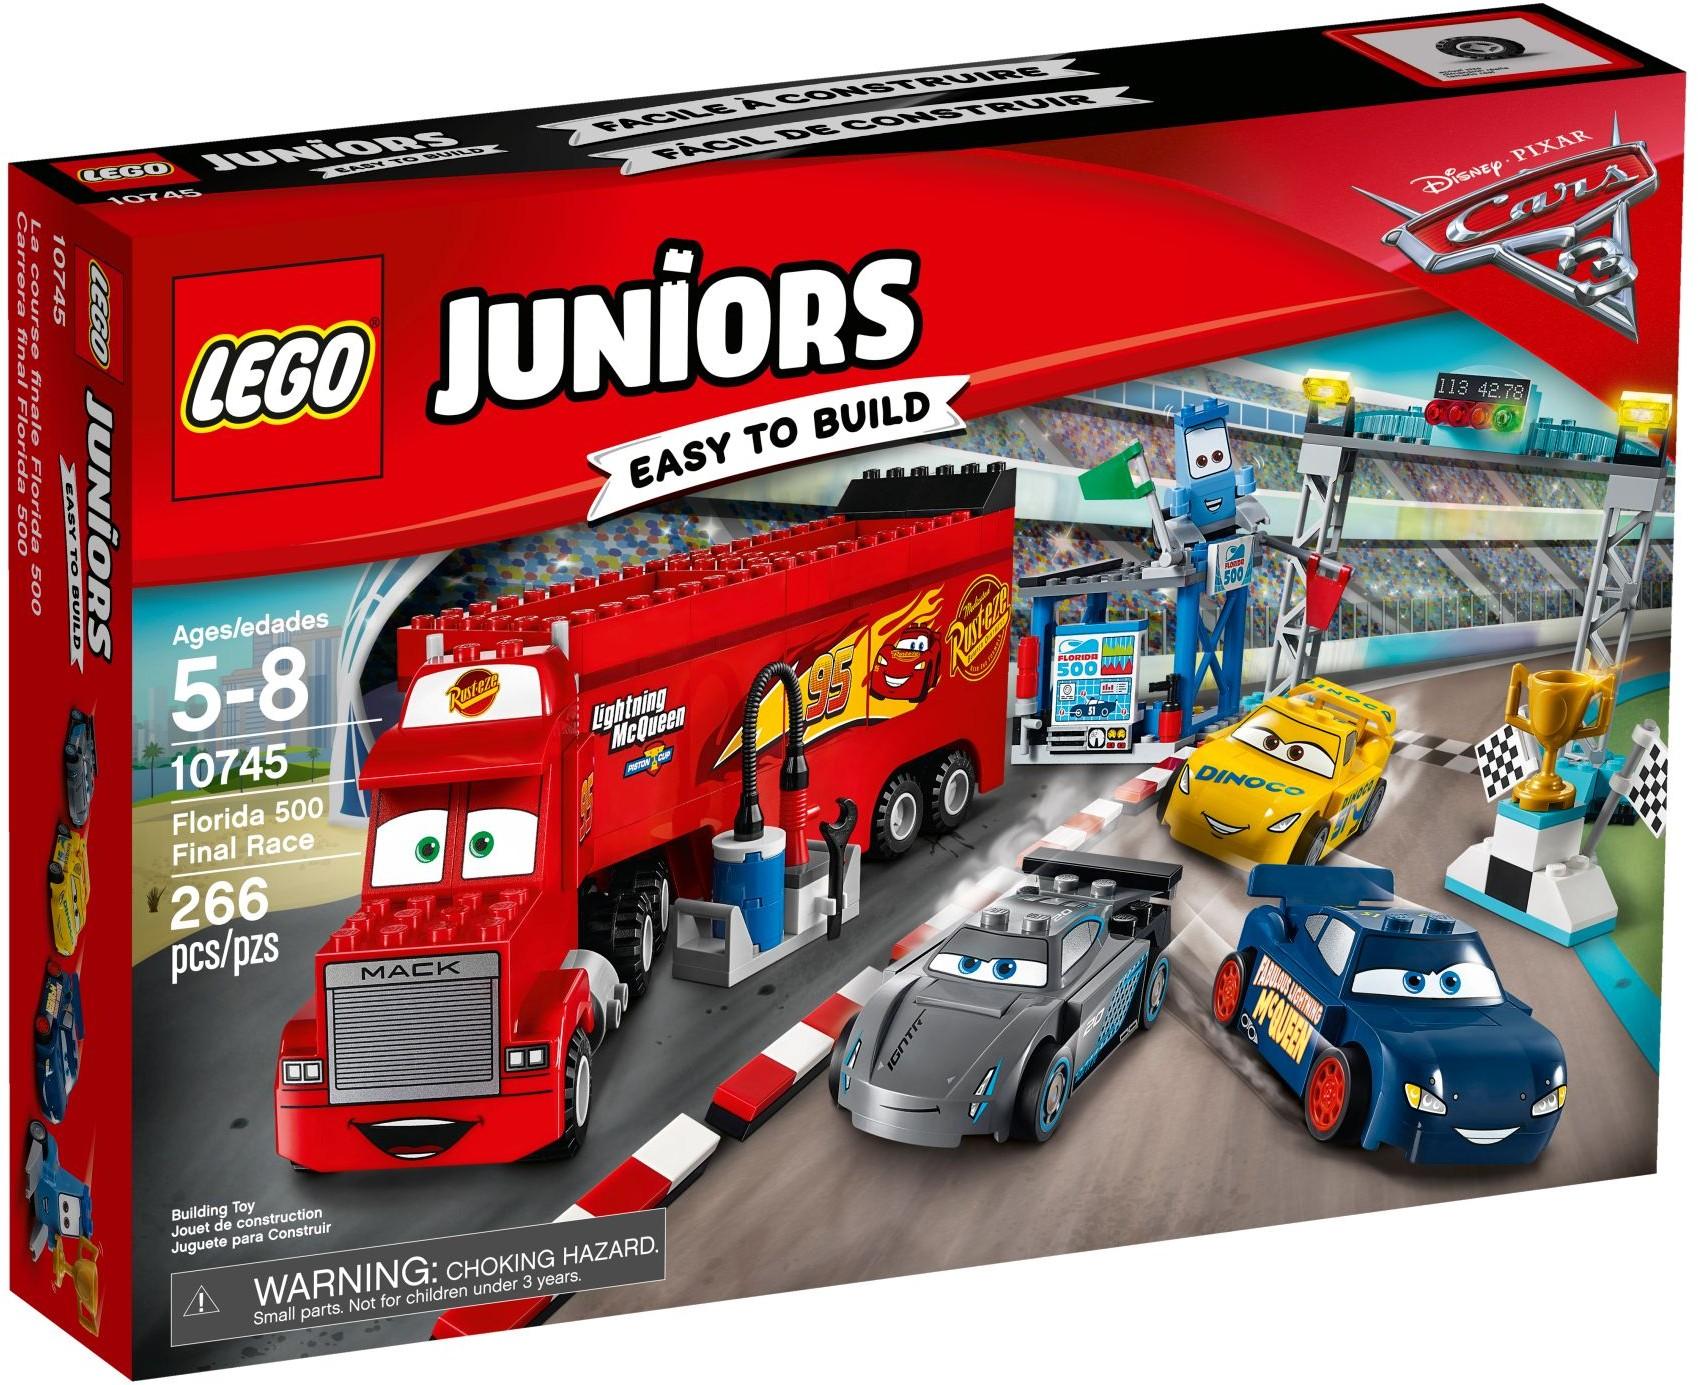 10745 LEGO Juniors  Florida 500 Final Race